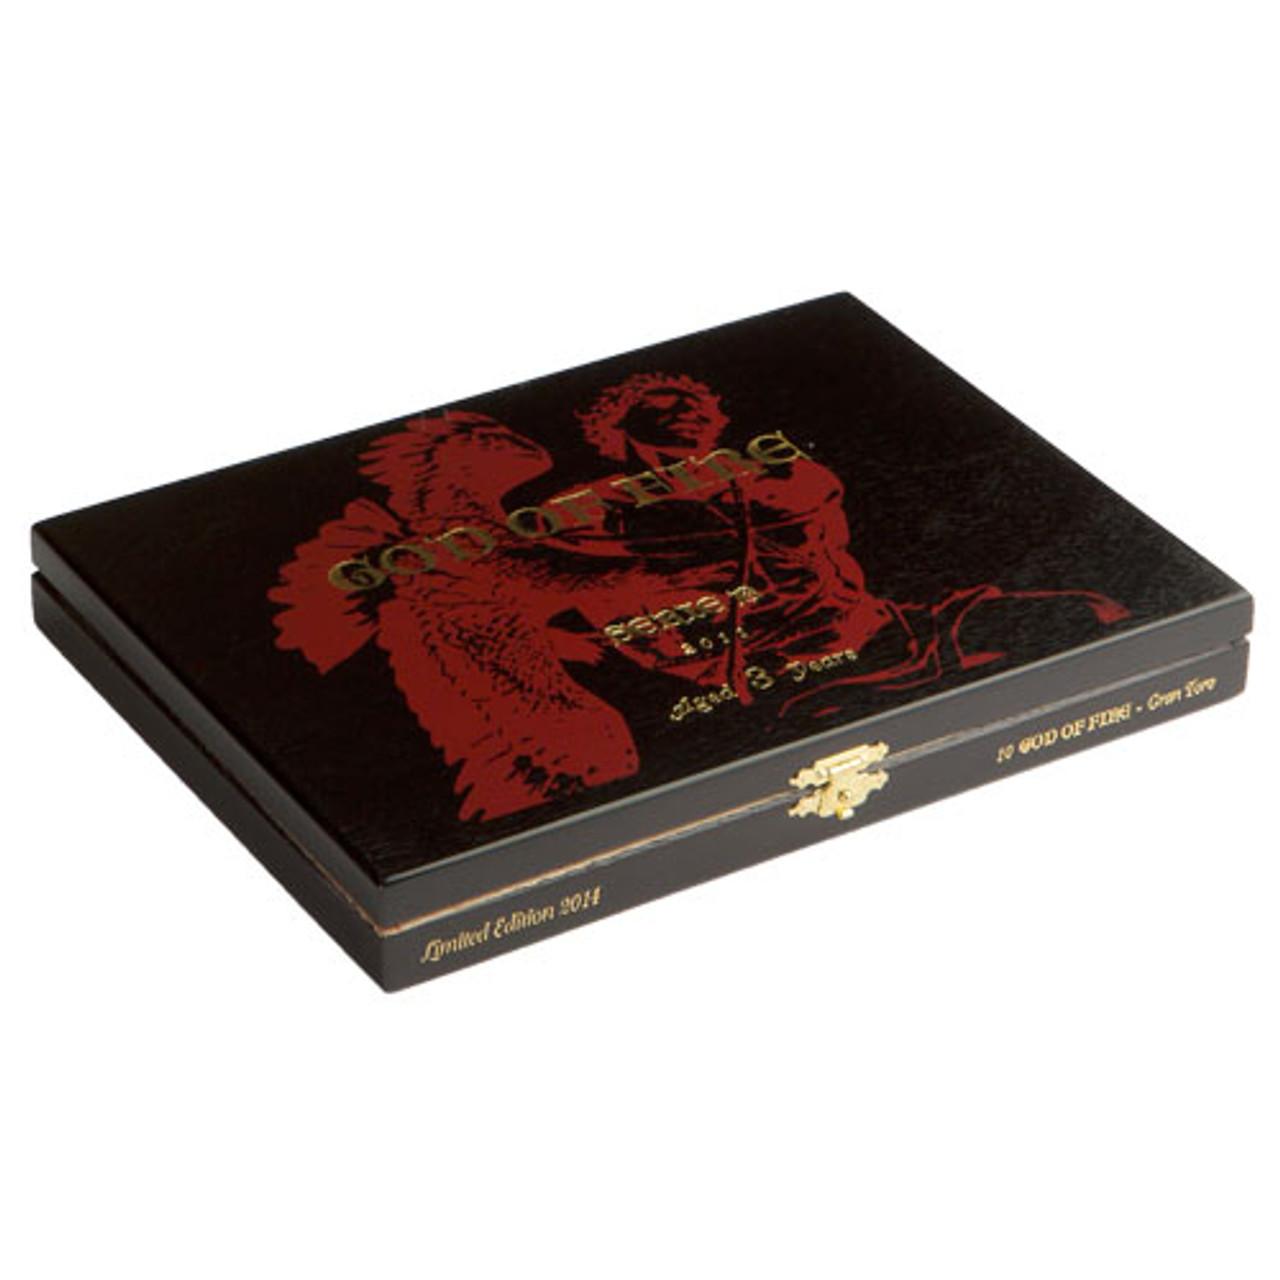 God of Fire Serie B Robusto Gordo Cigars - 5.5 x 54 (Box of 10)